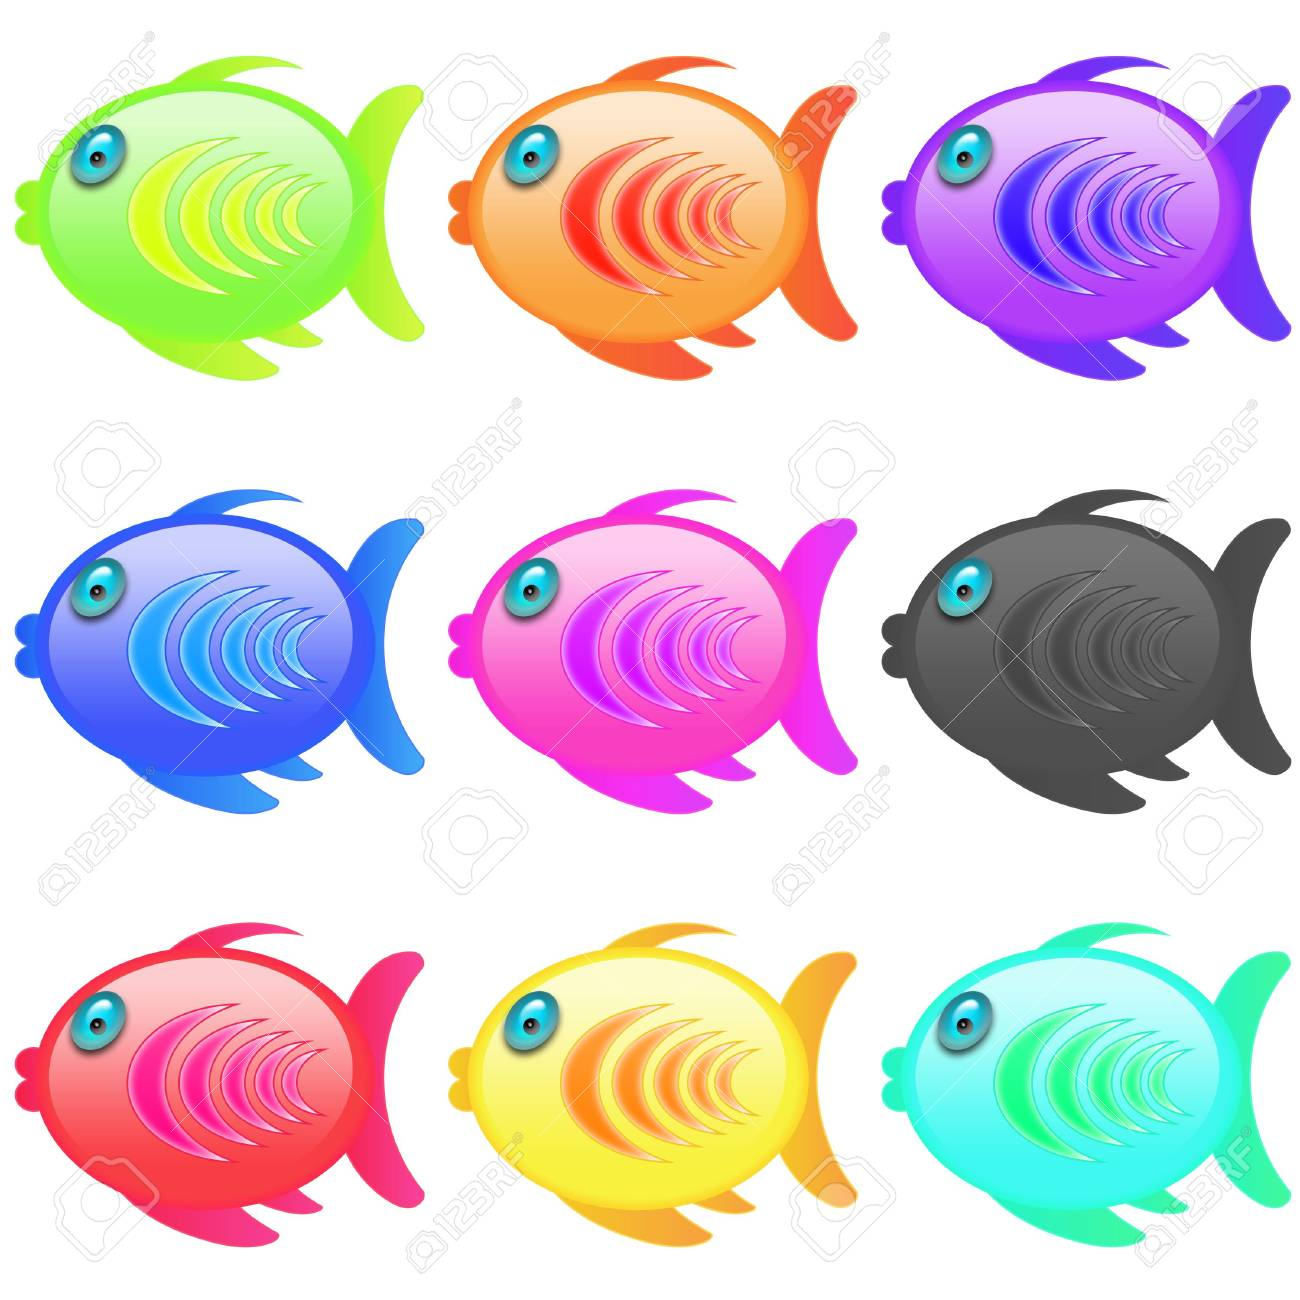 series of multicolor cartoon style icon fish Stock Photo - 5213355